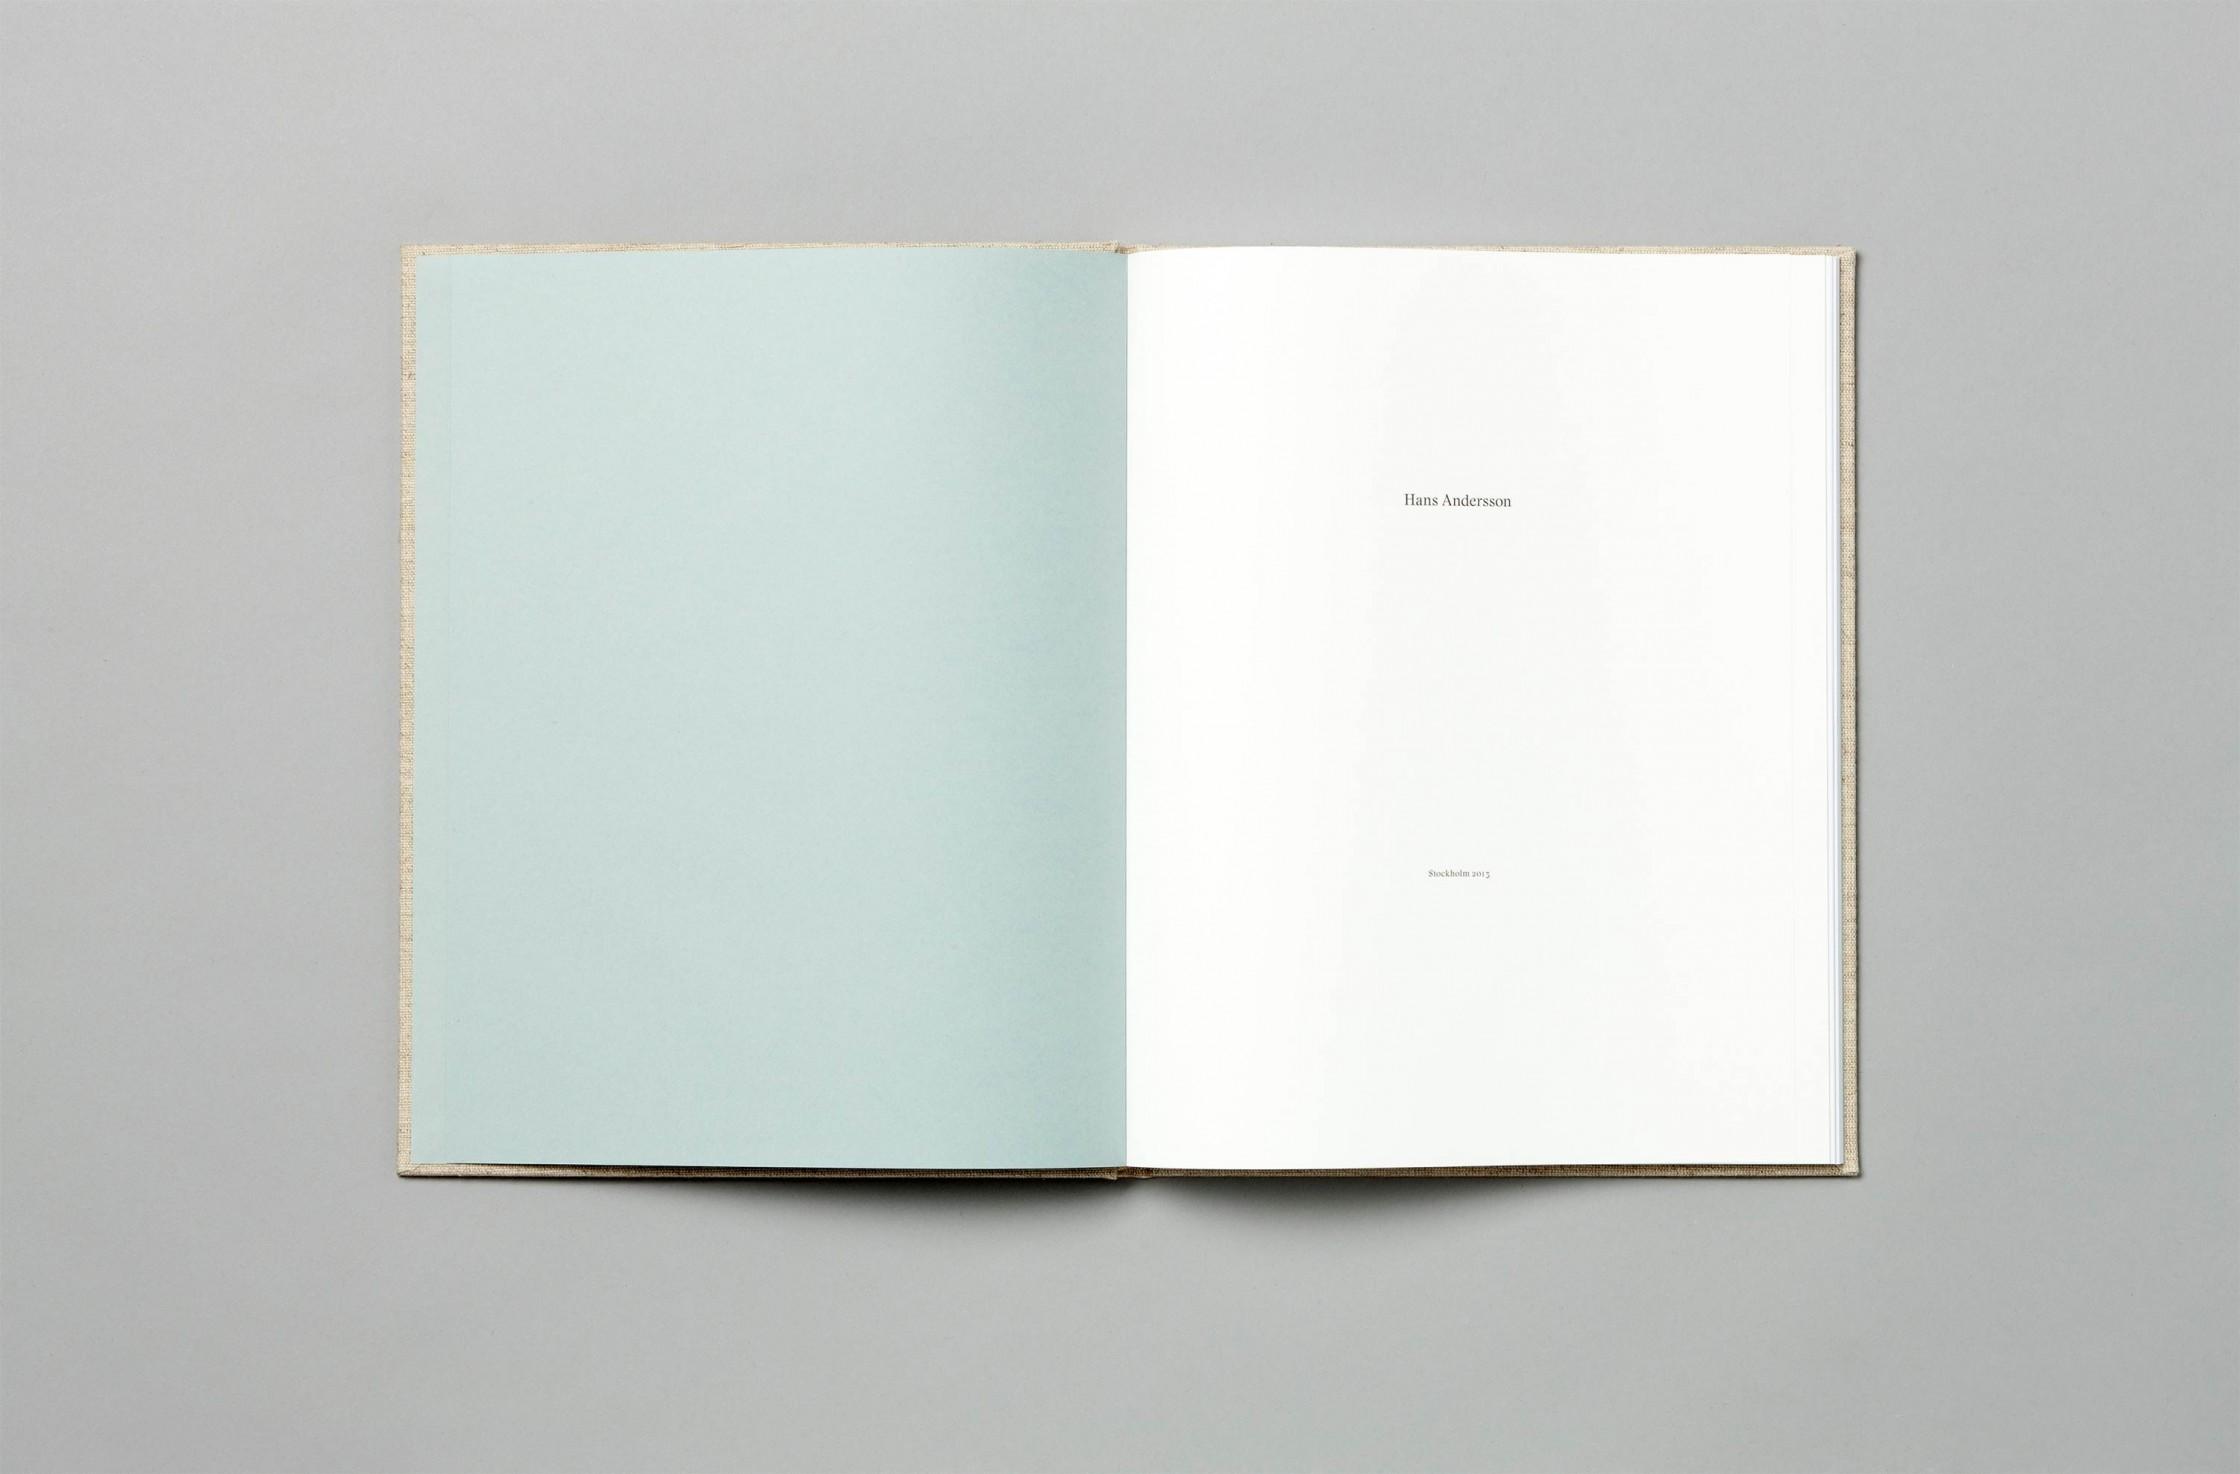 ritator_hans_andersson_artist_book_4@2x